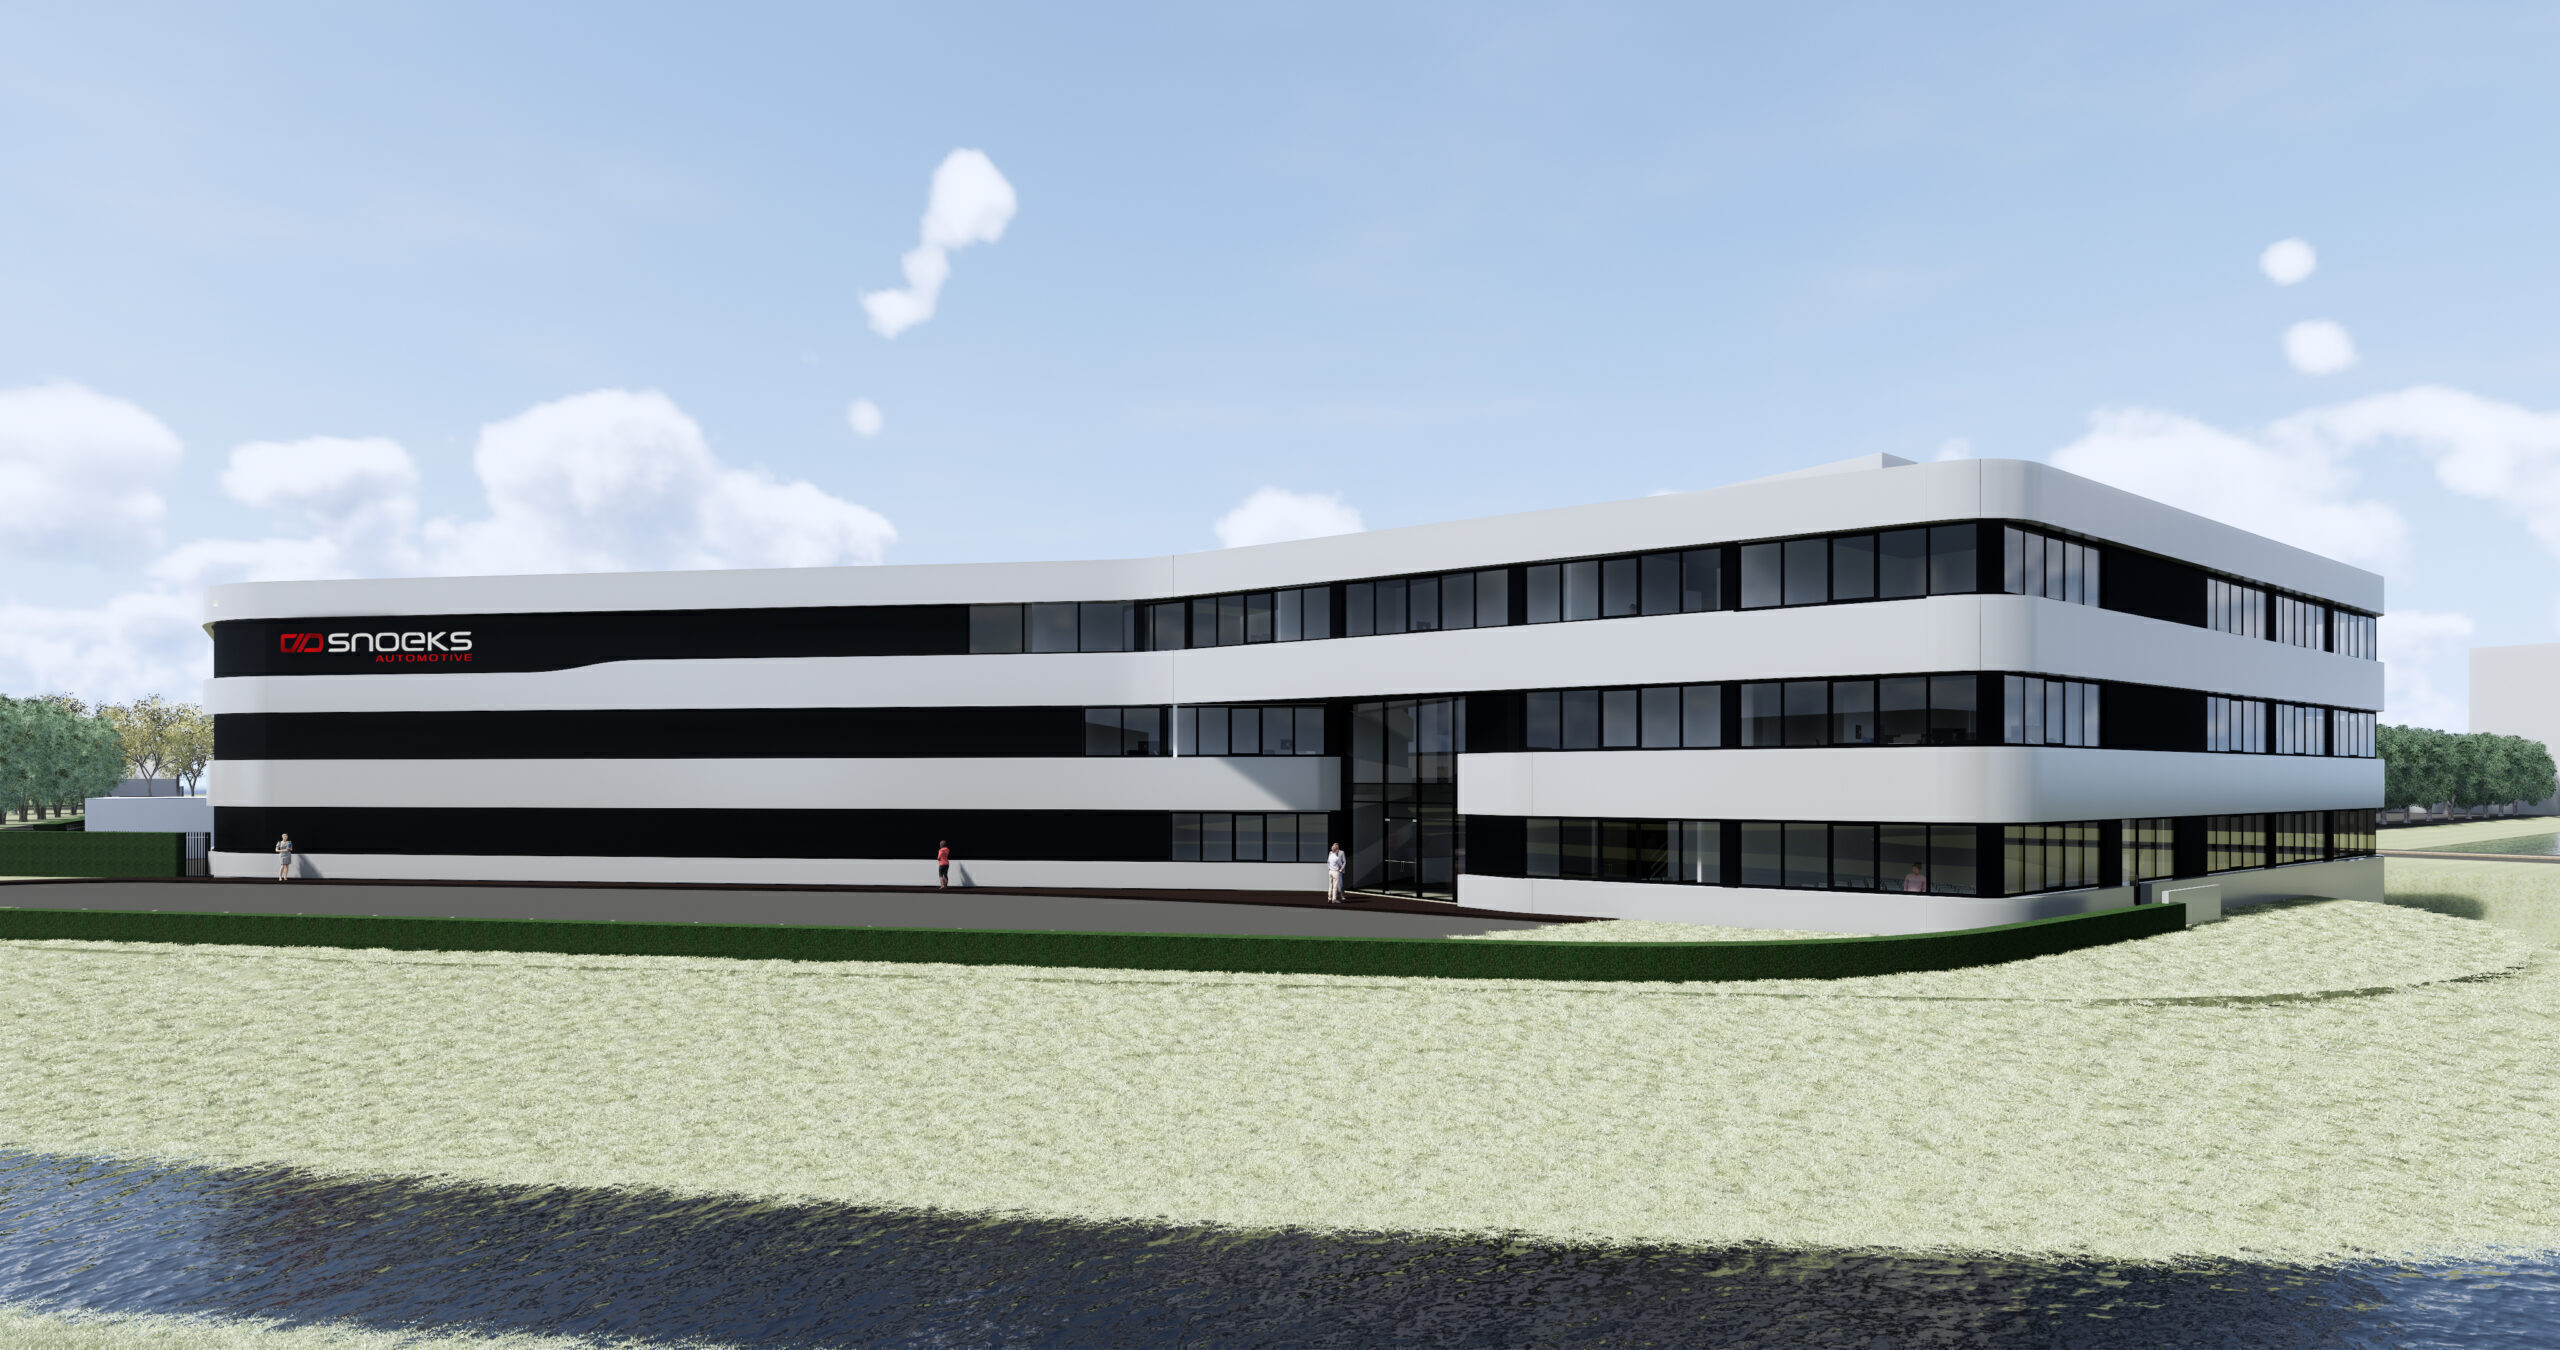 Baubeginn des Snoeks-Innovationszentrums